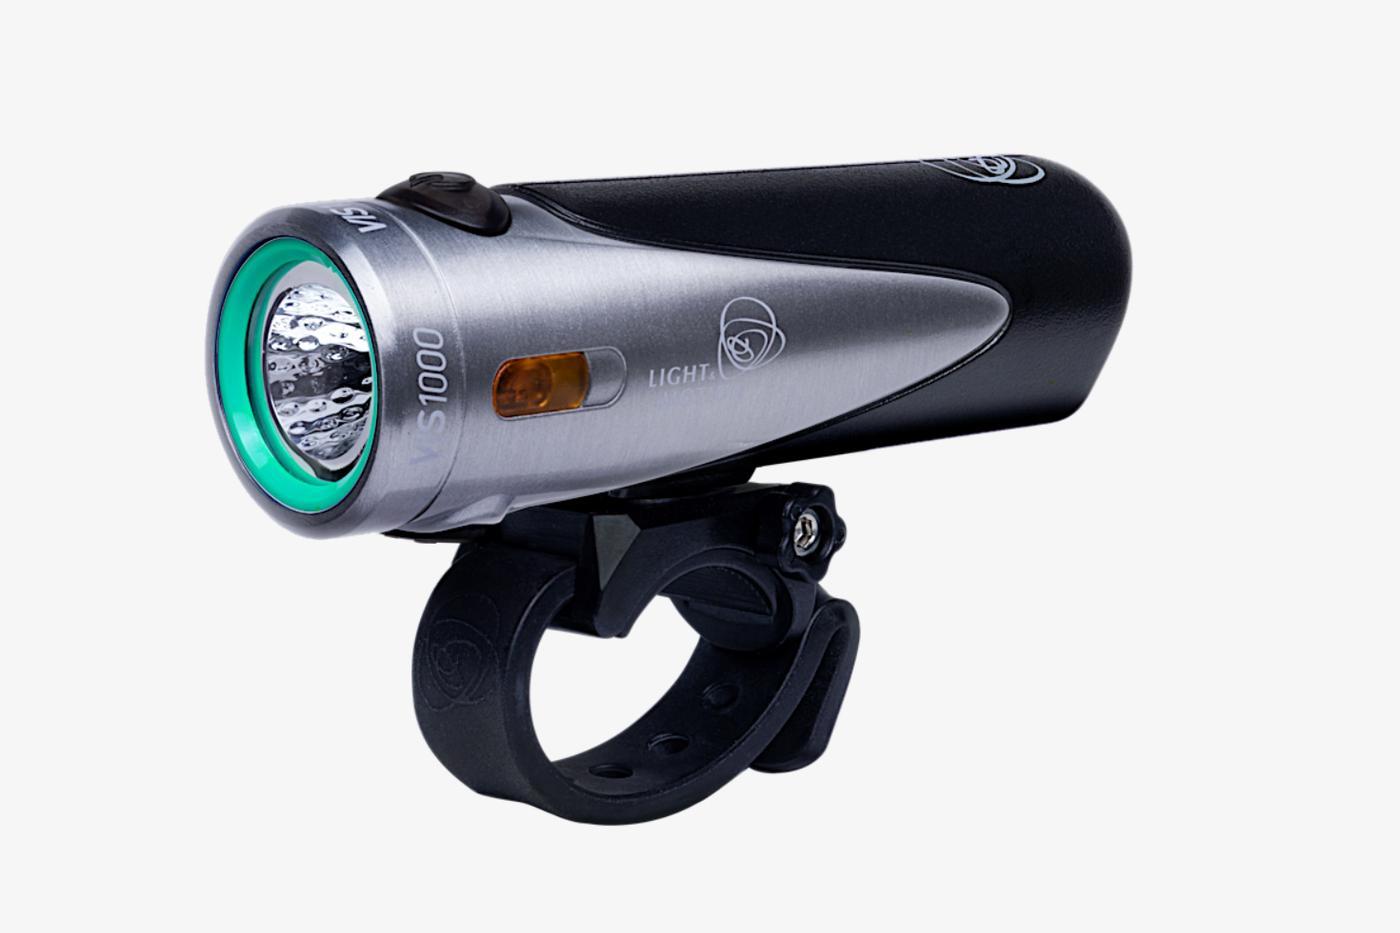 Light & Motion: You Can Customize a VIS 1000 Bike Light